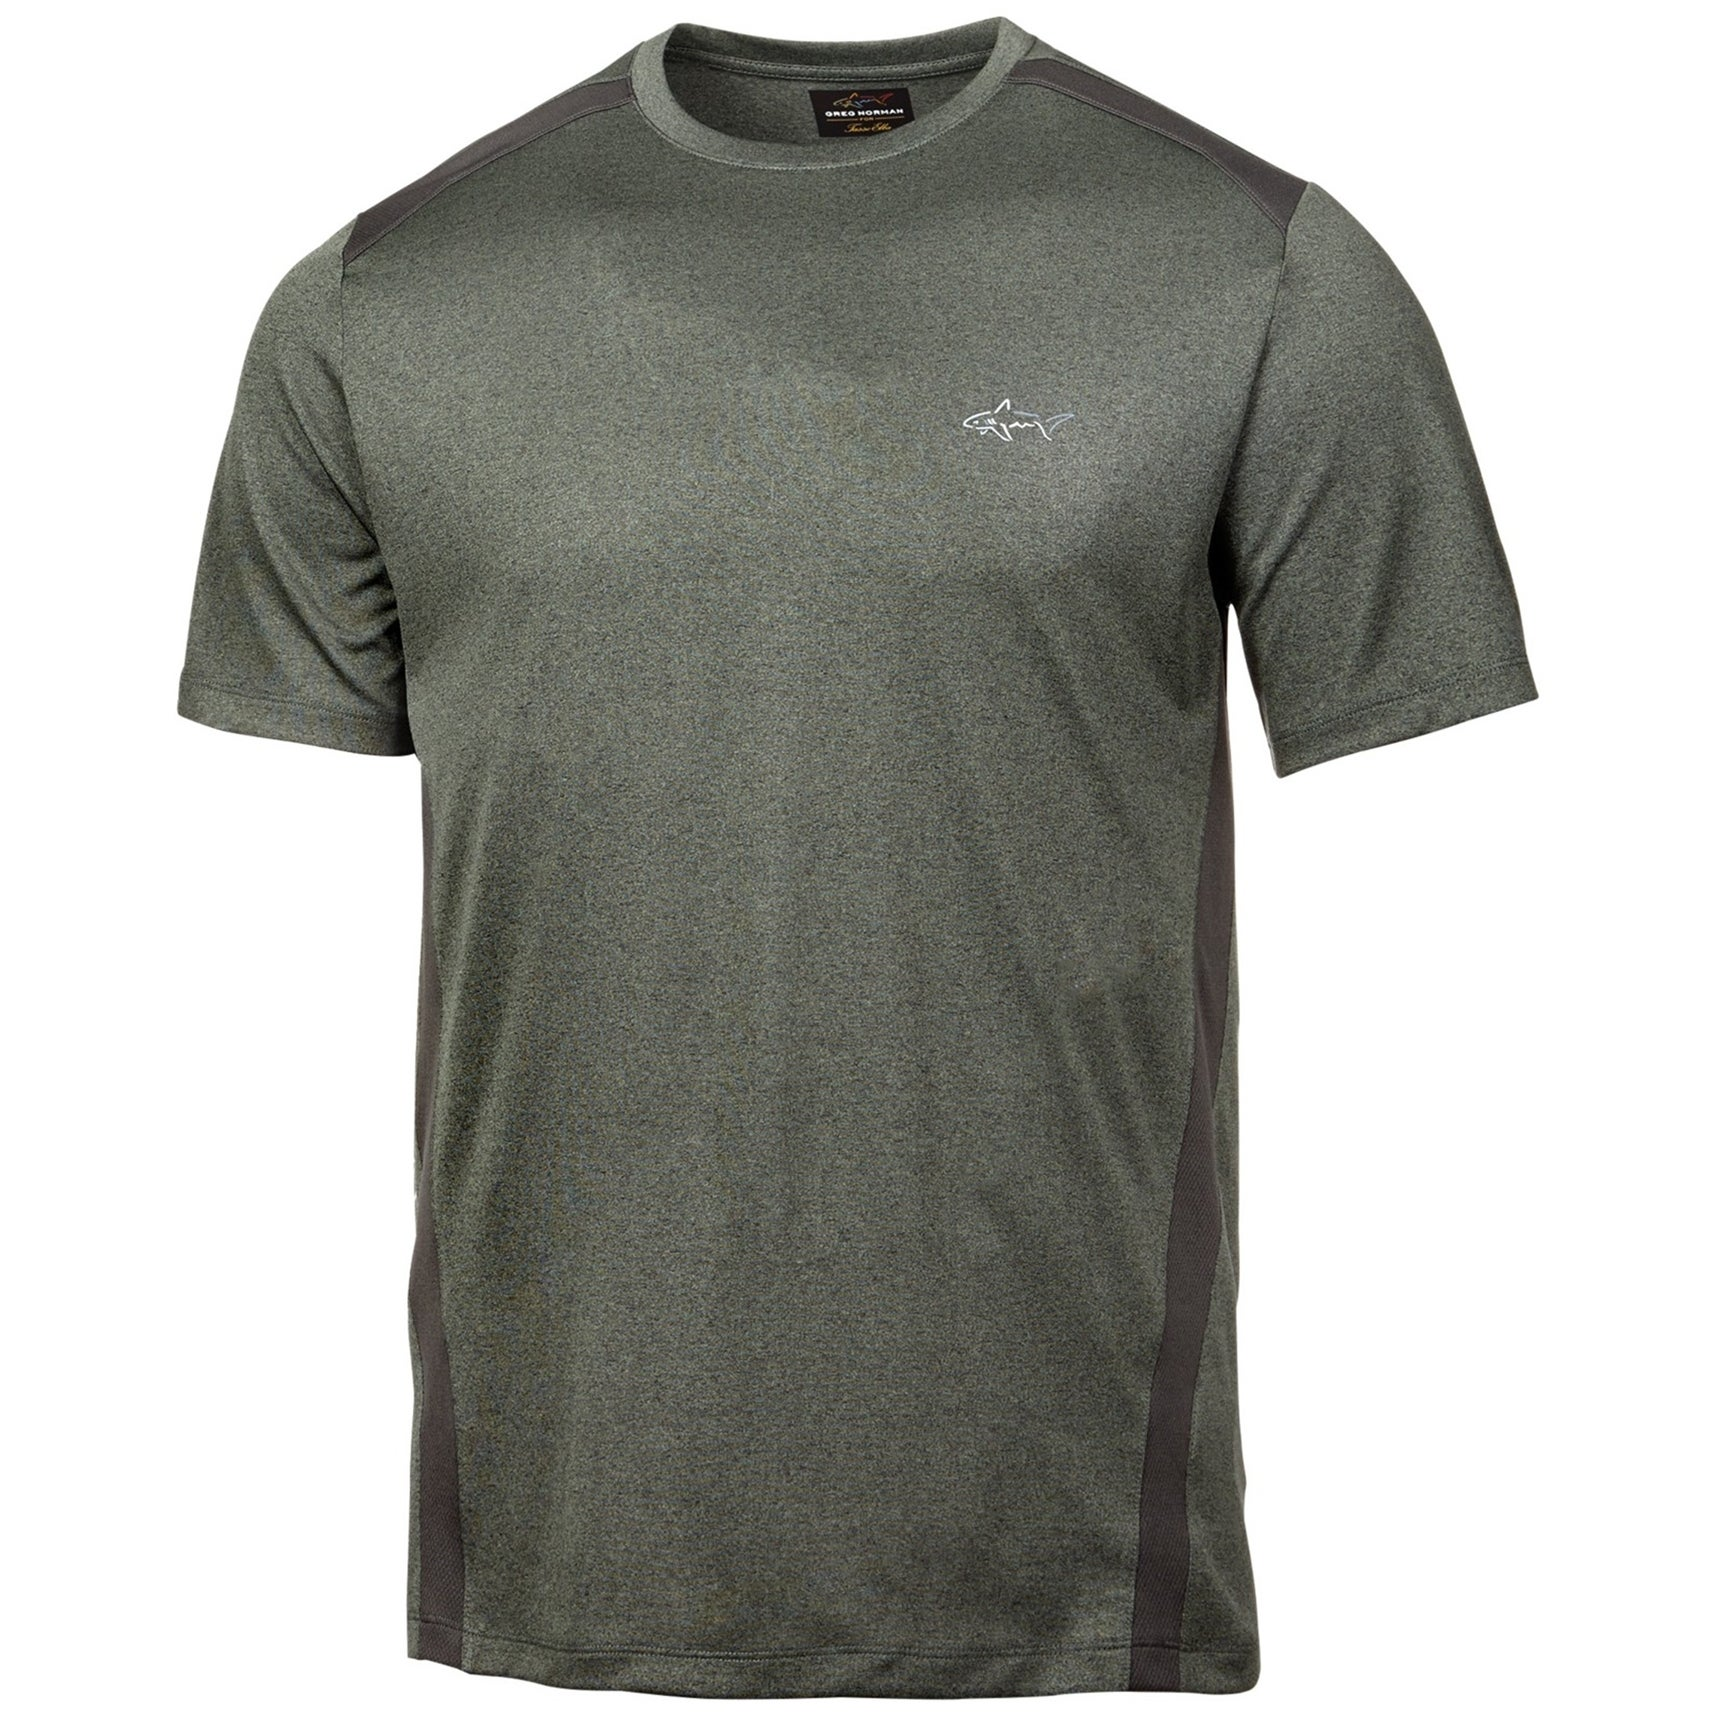 Greg Norman Mens Thermal Basic T-Shirt